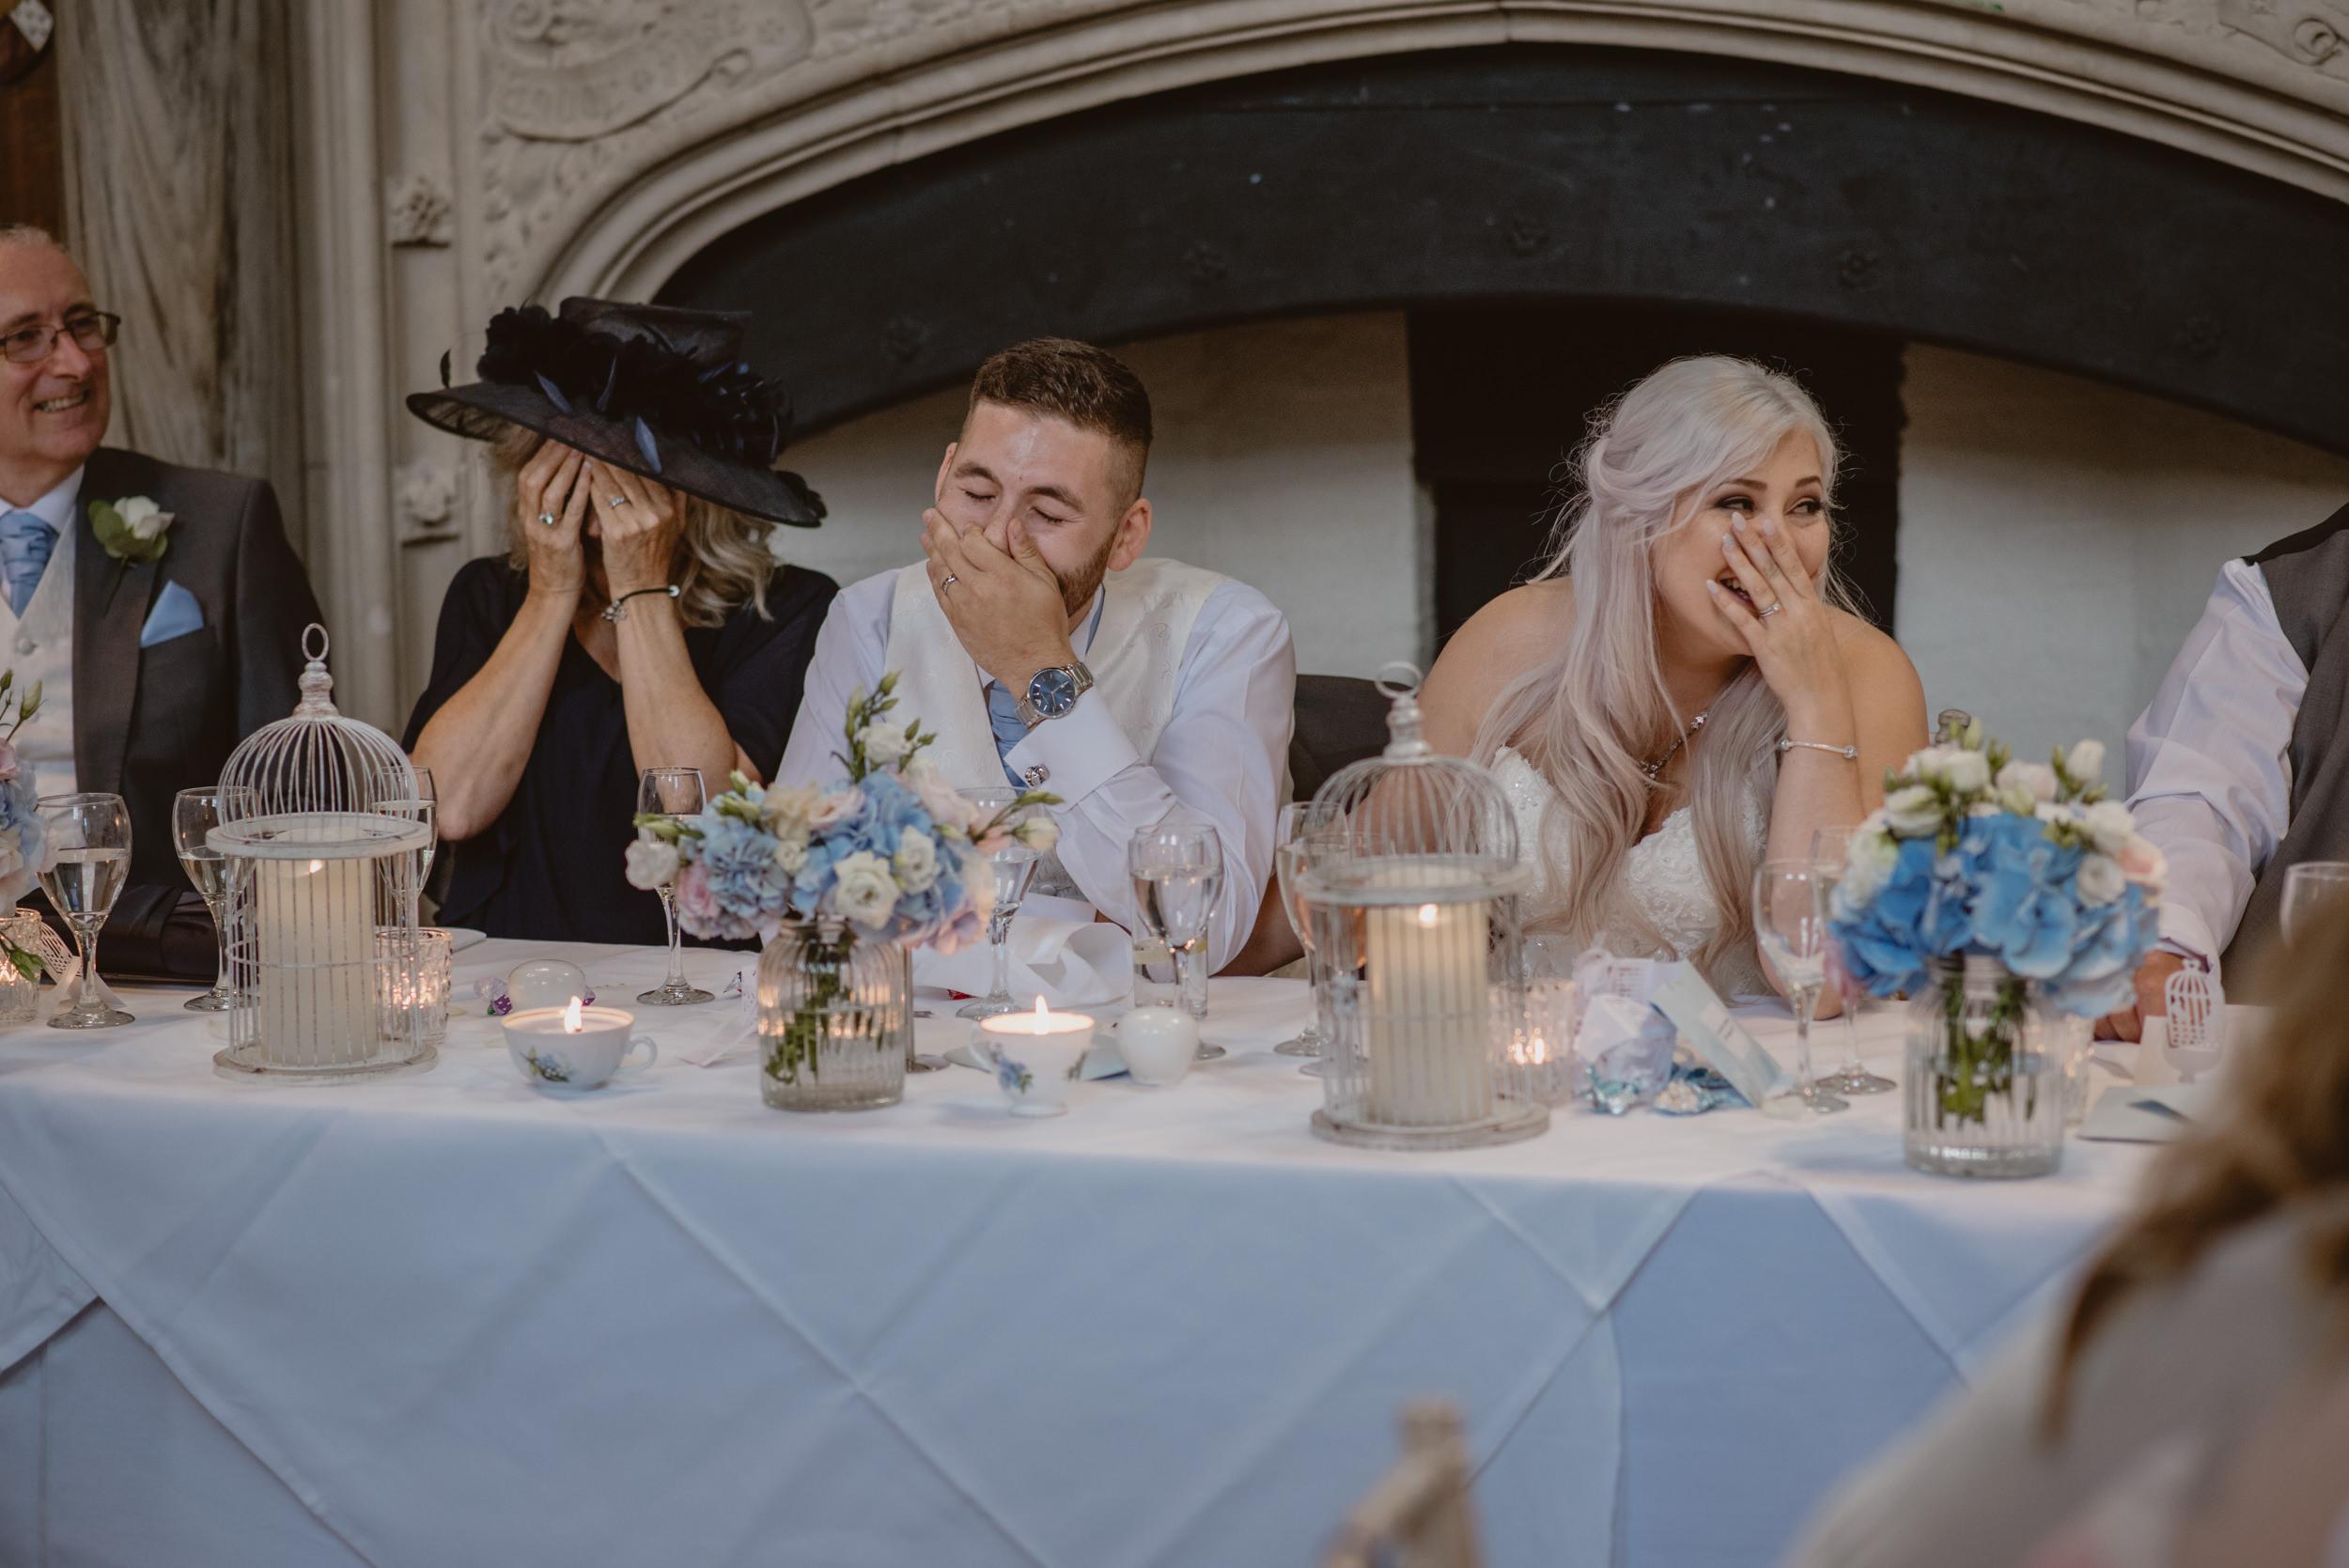 Rachel-and-James-Wedding-Horsley-Towers-State-Manu-Mendoza-Wedding-Photography-438.jpg